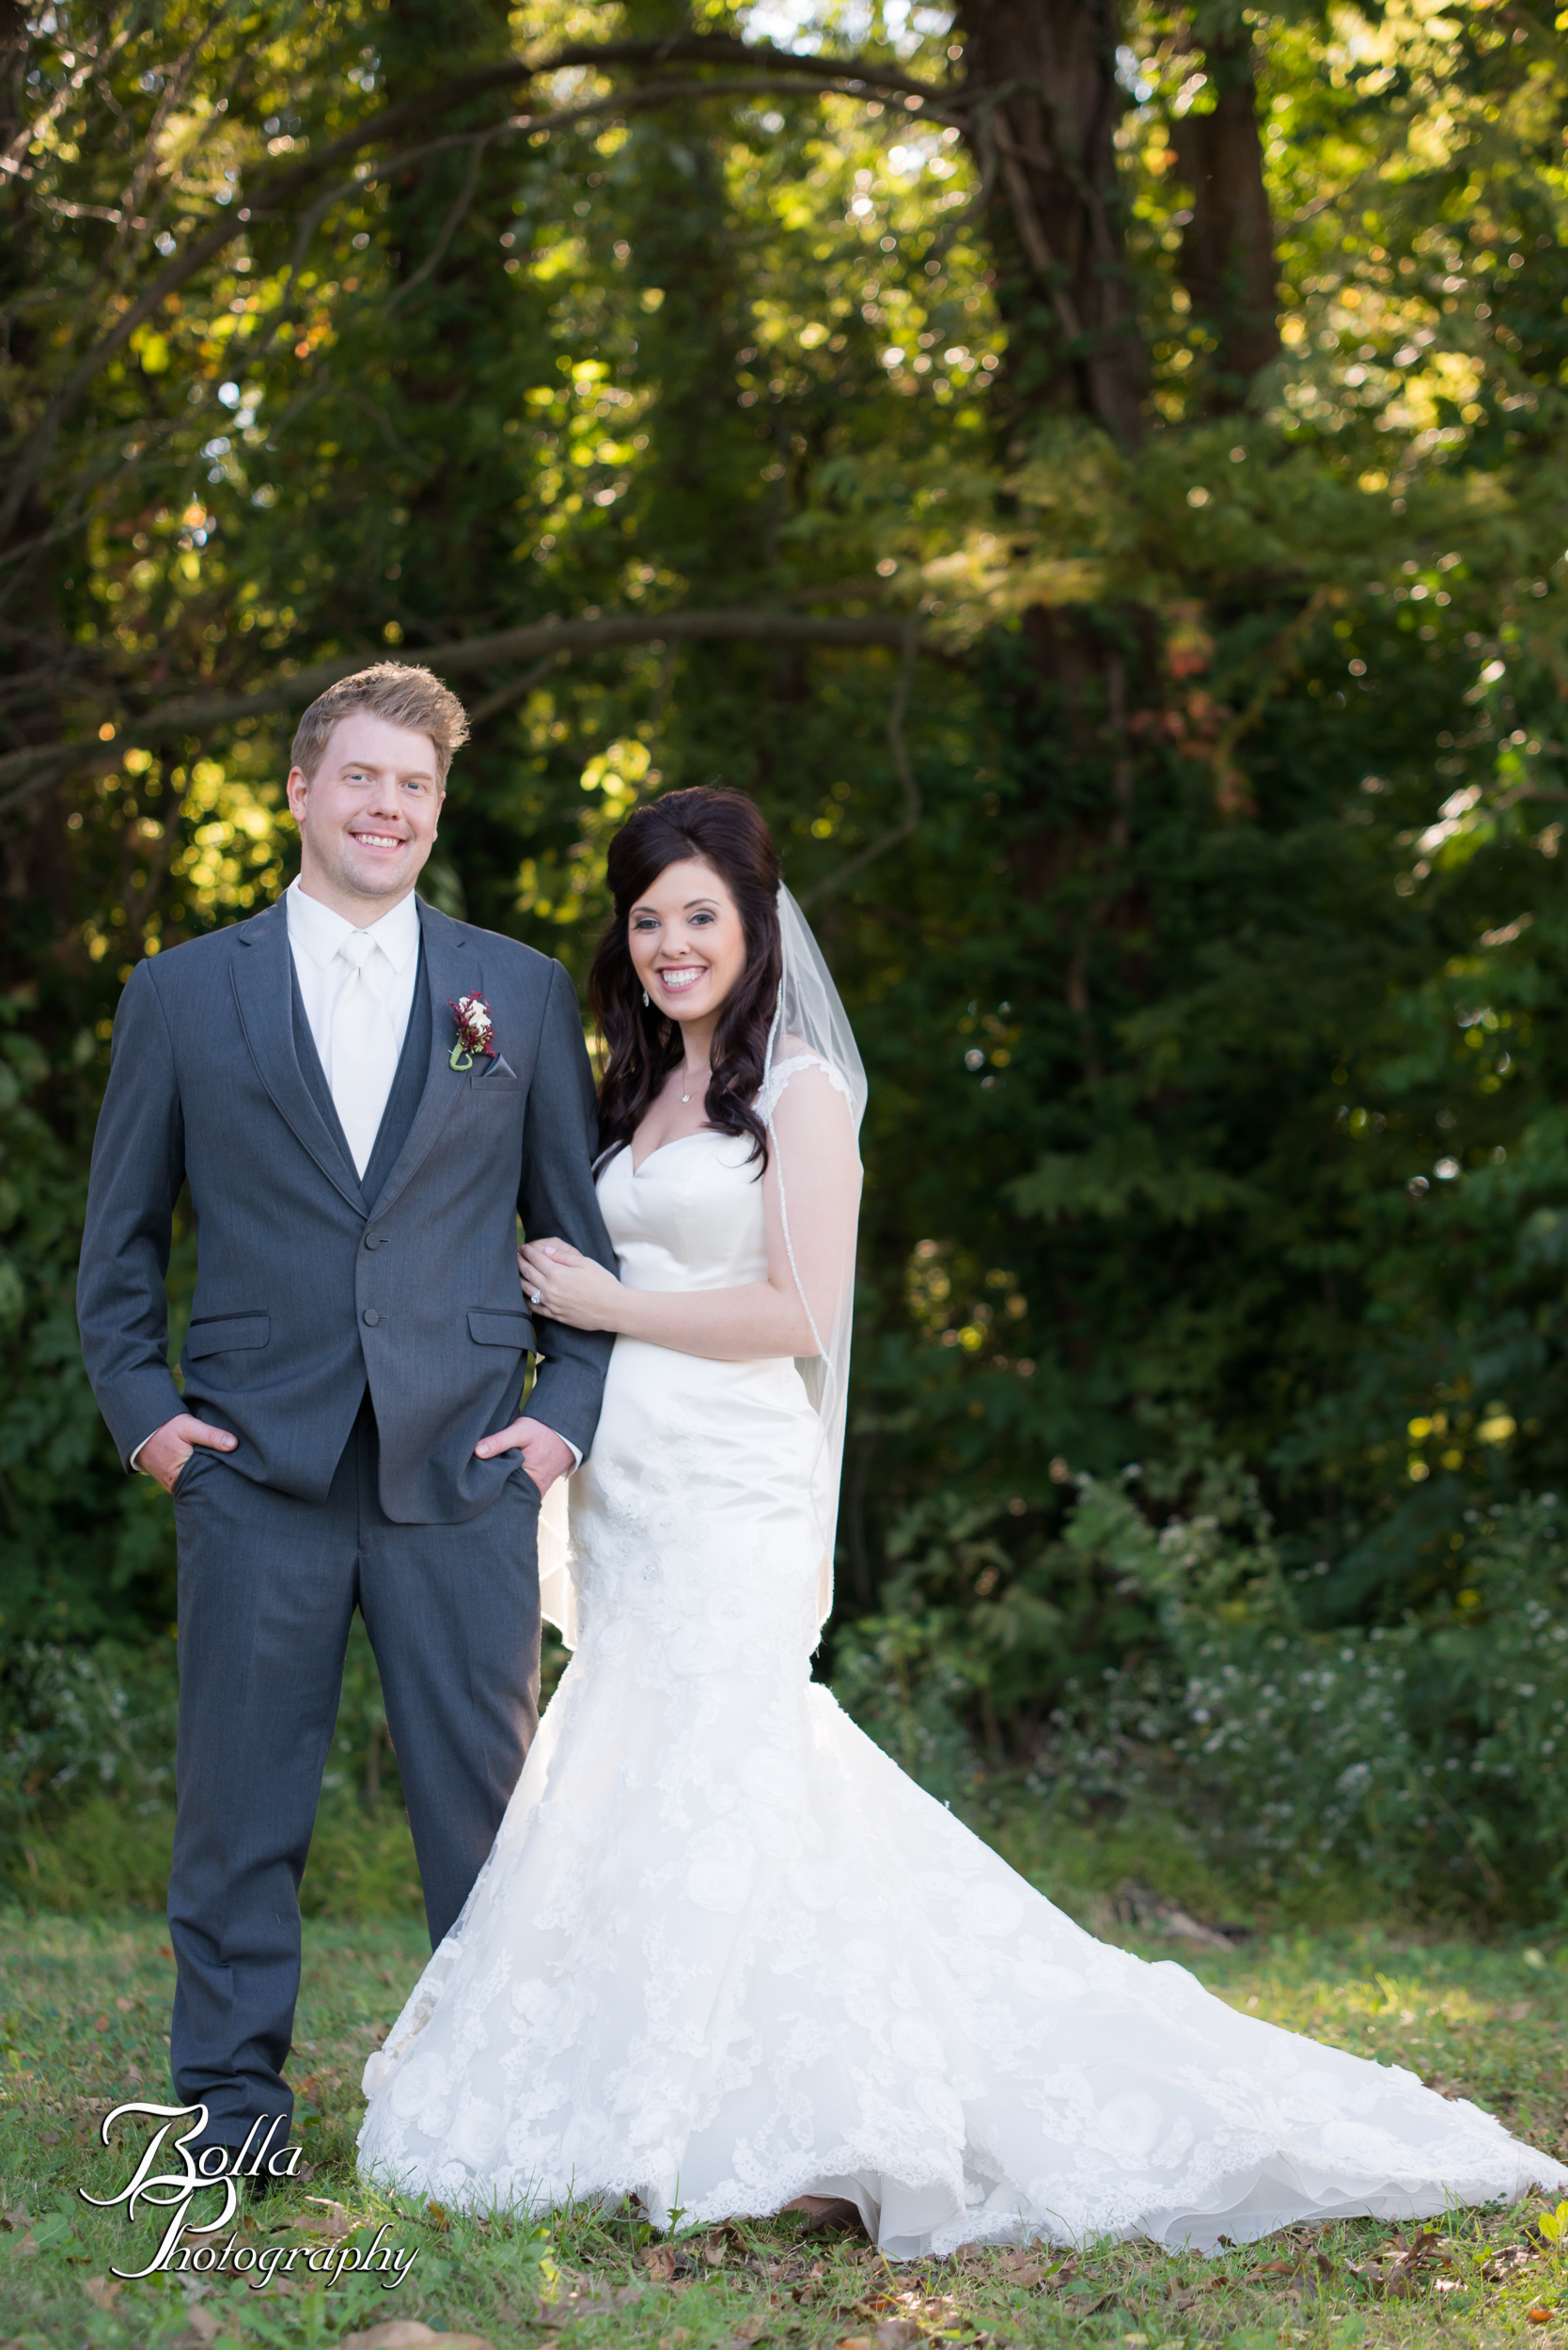 Bolla_photography_edwardsville_wedding_photographer_st_louis_weddings_Reilmann-0005.jpg